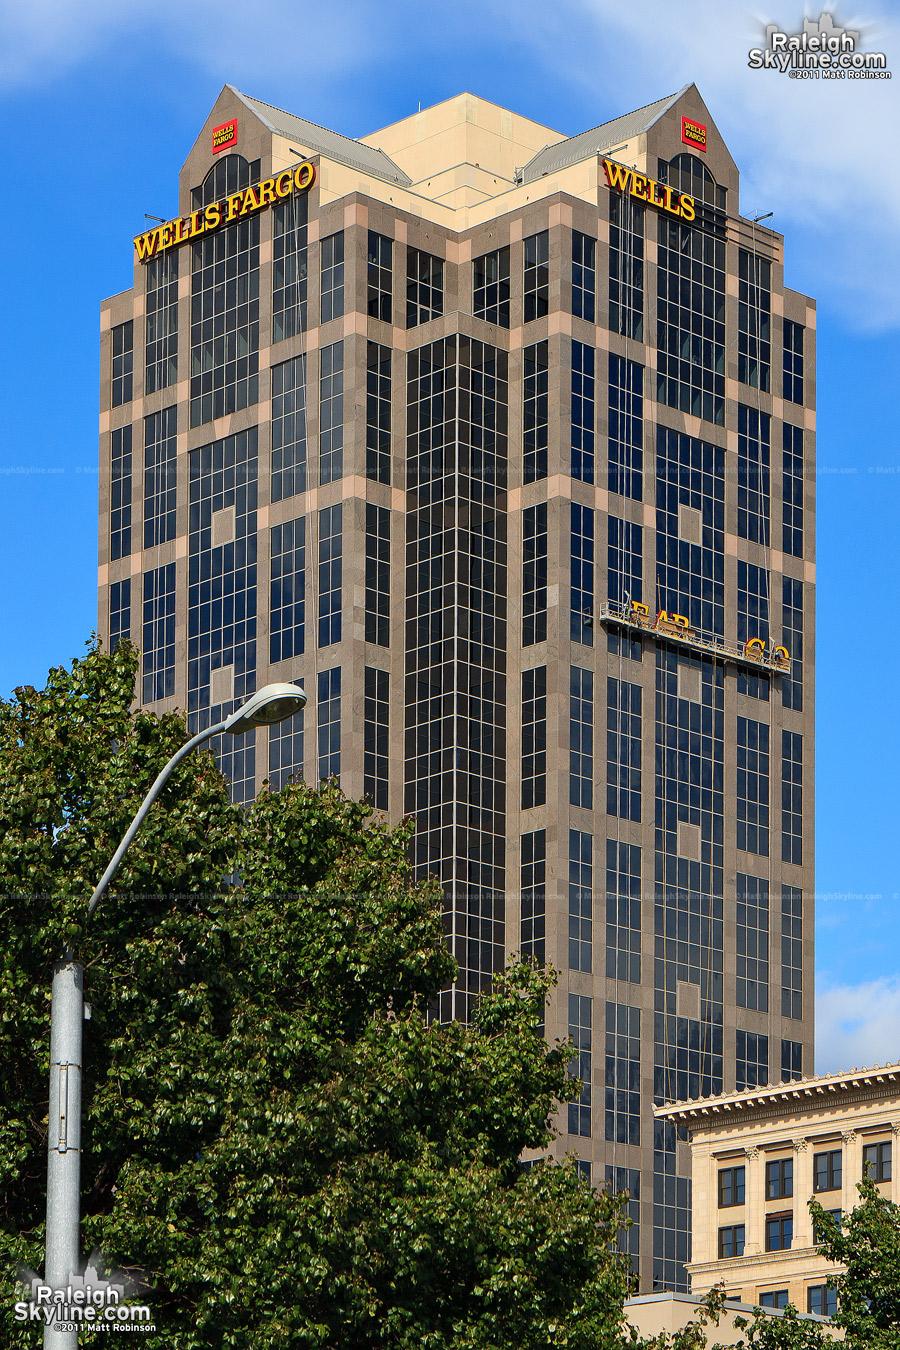 Well Fargo climbs up the building